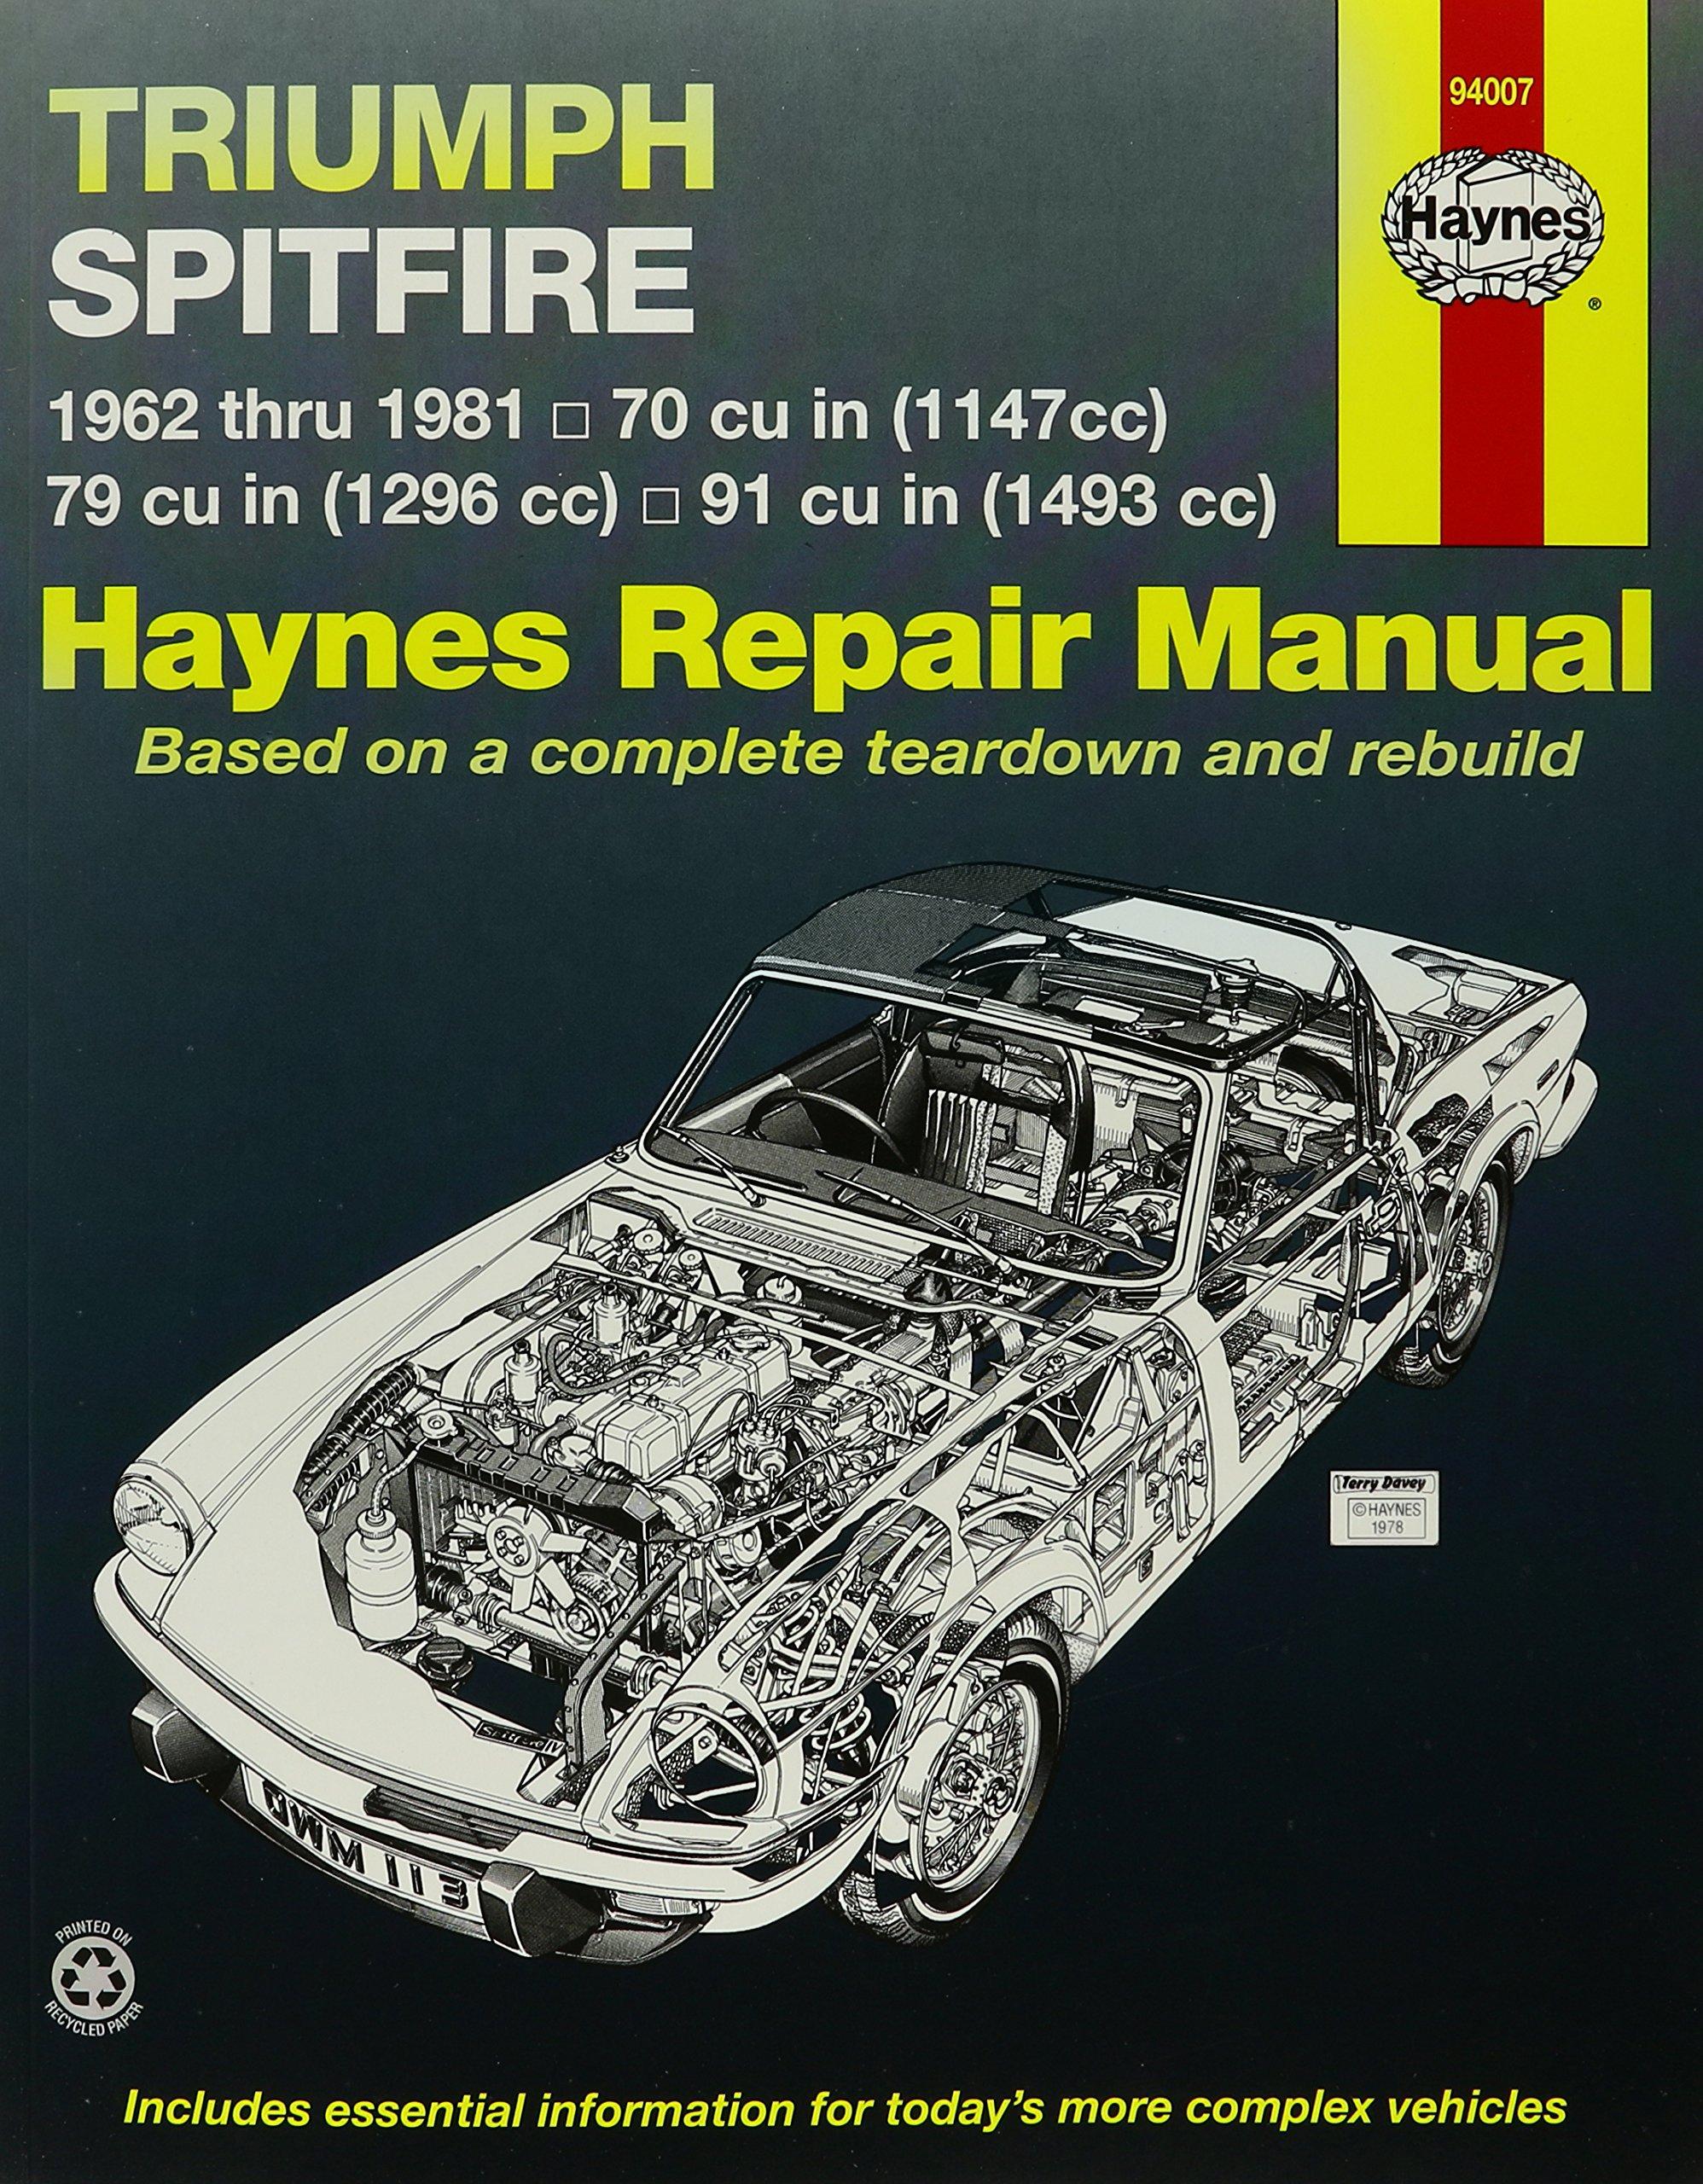 Triumph Spitfire Mk.1, 2, 3, 4 & 1500 1962-81 Owner's Workshop Manual  (Service & repair manuals): Amazon.co.uk: Peter G. Strasman, J. H. Haynes:  ...